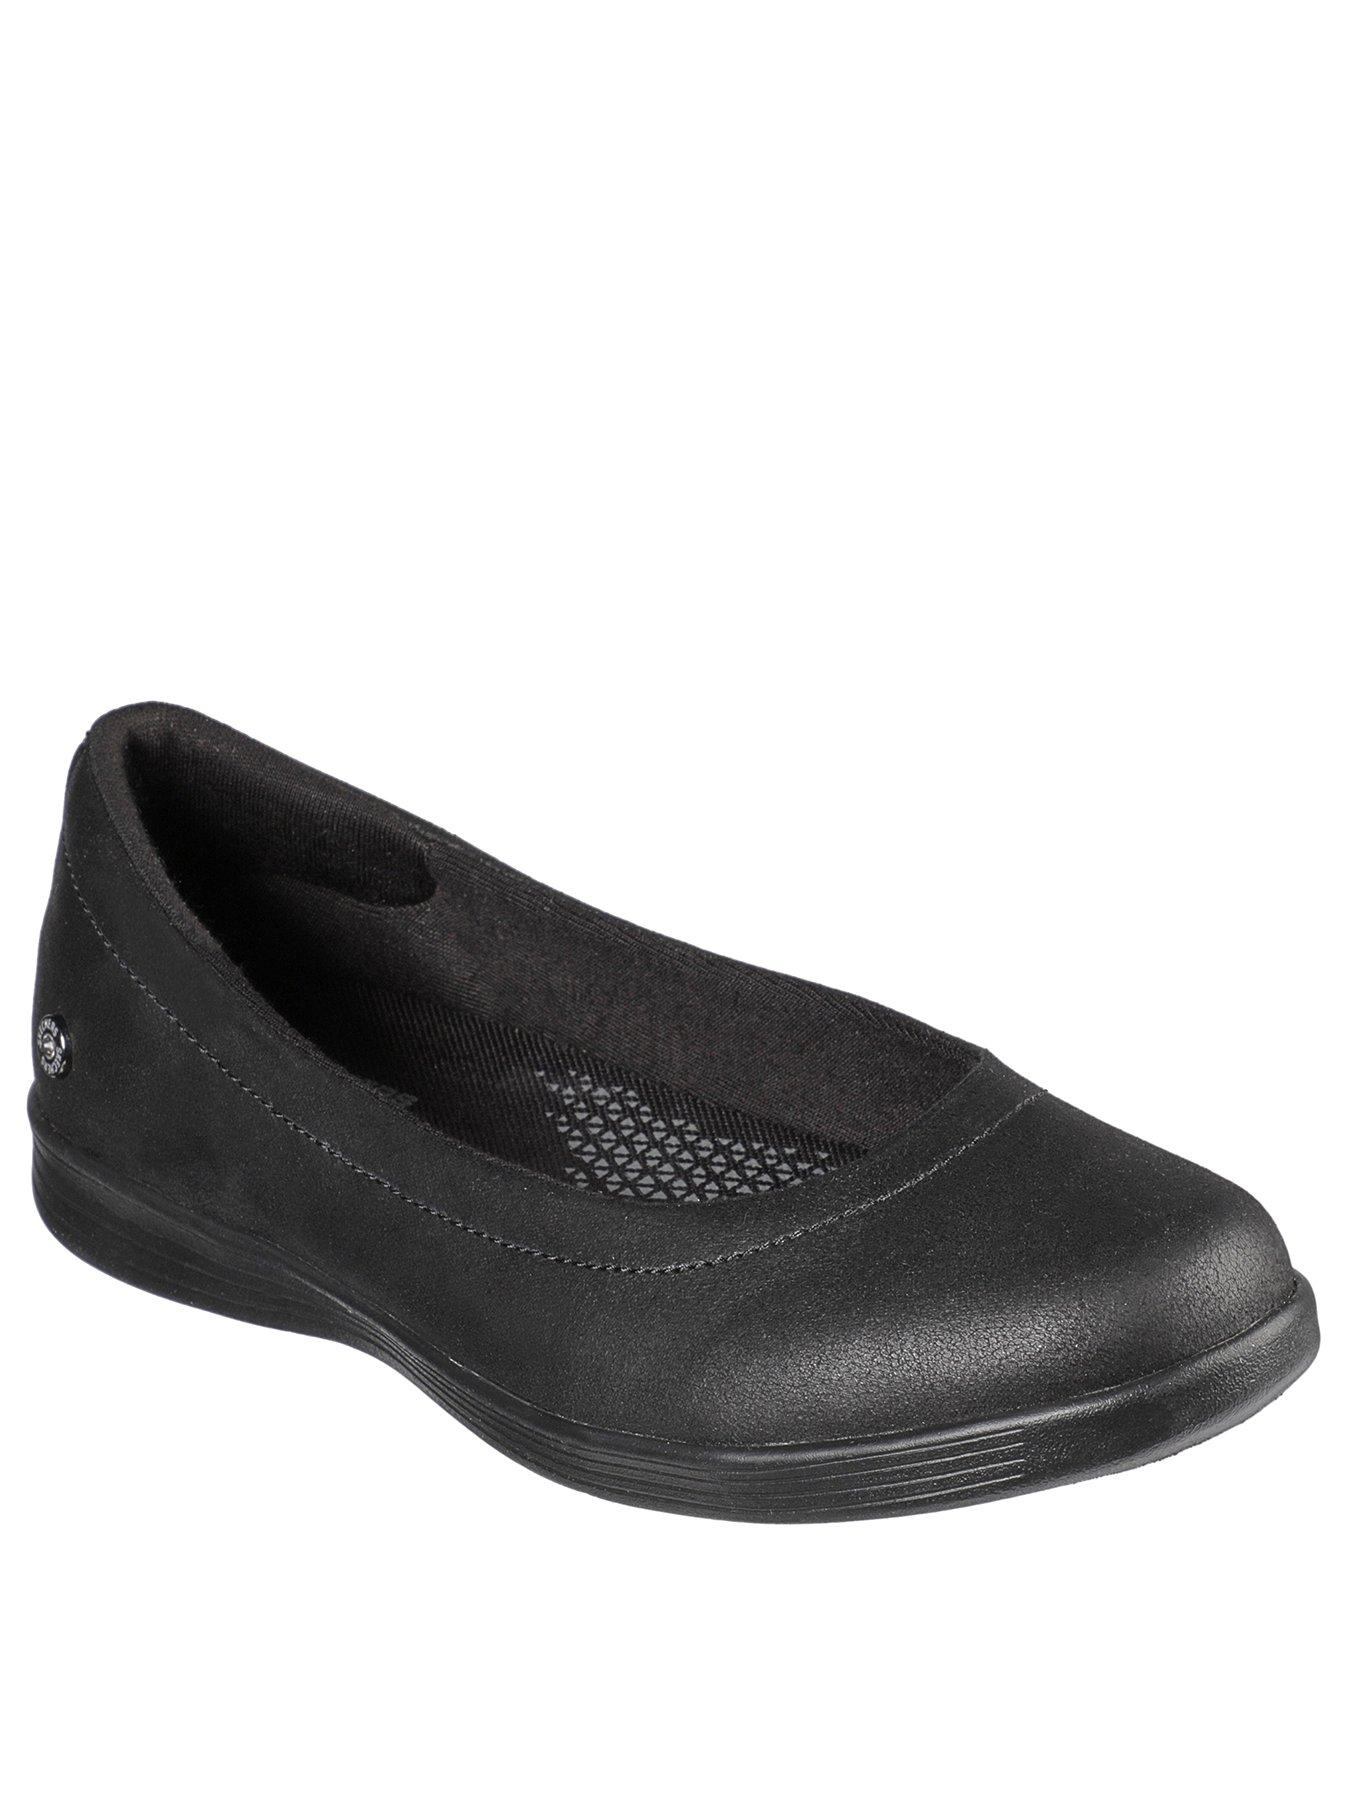 Skechers Shoes \u0026 Trainers | Women \u0026 Men